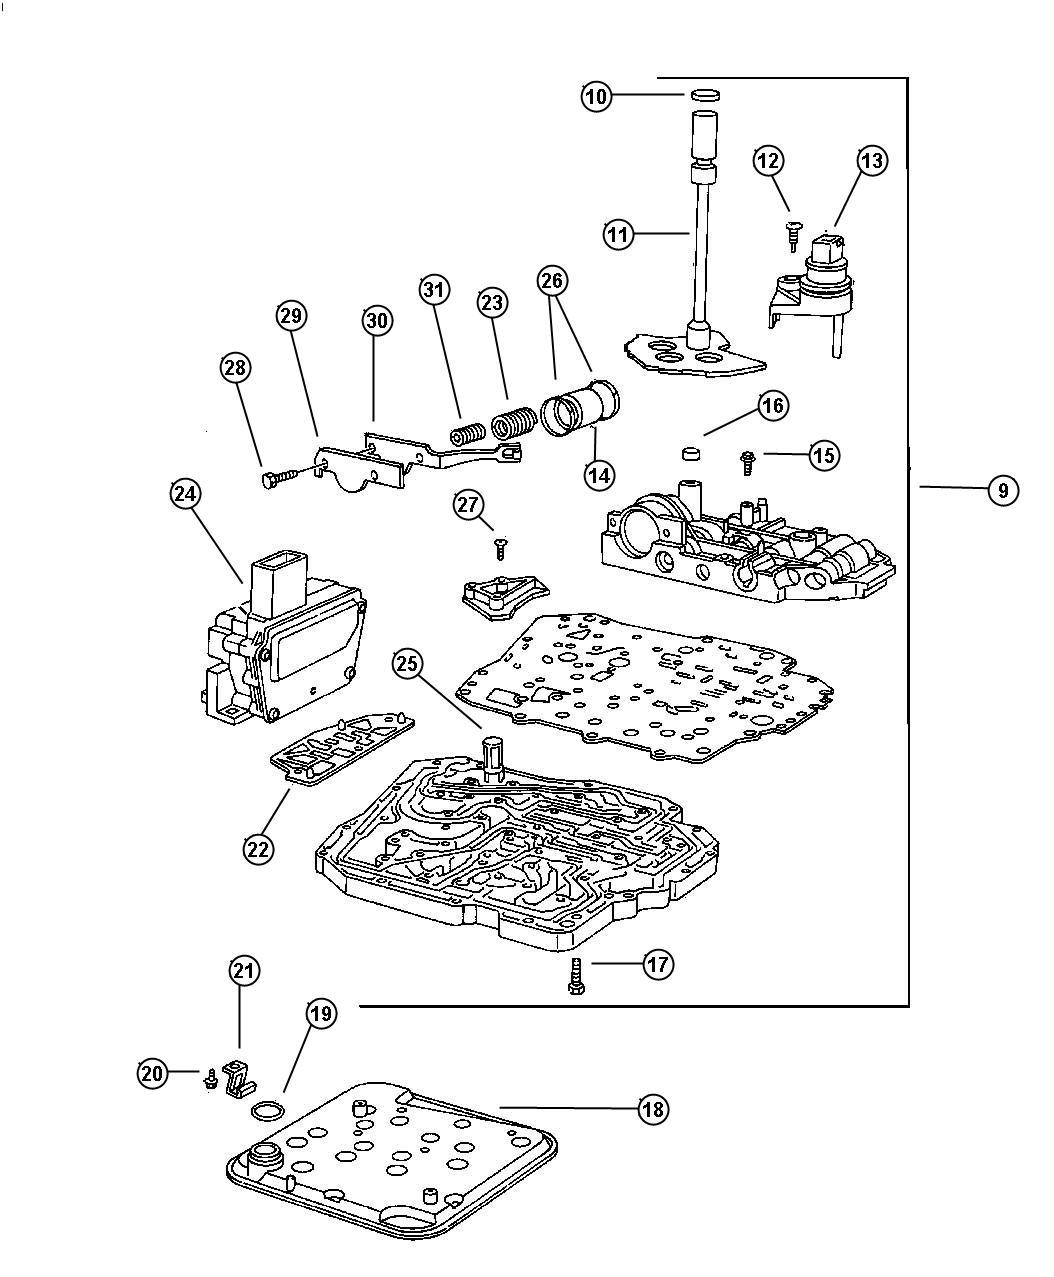 1997 Chrysler LHS Sensor. Manual valve lever. Up to 9-29